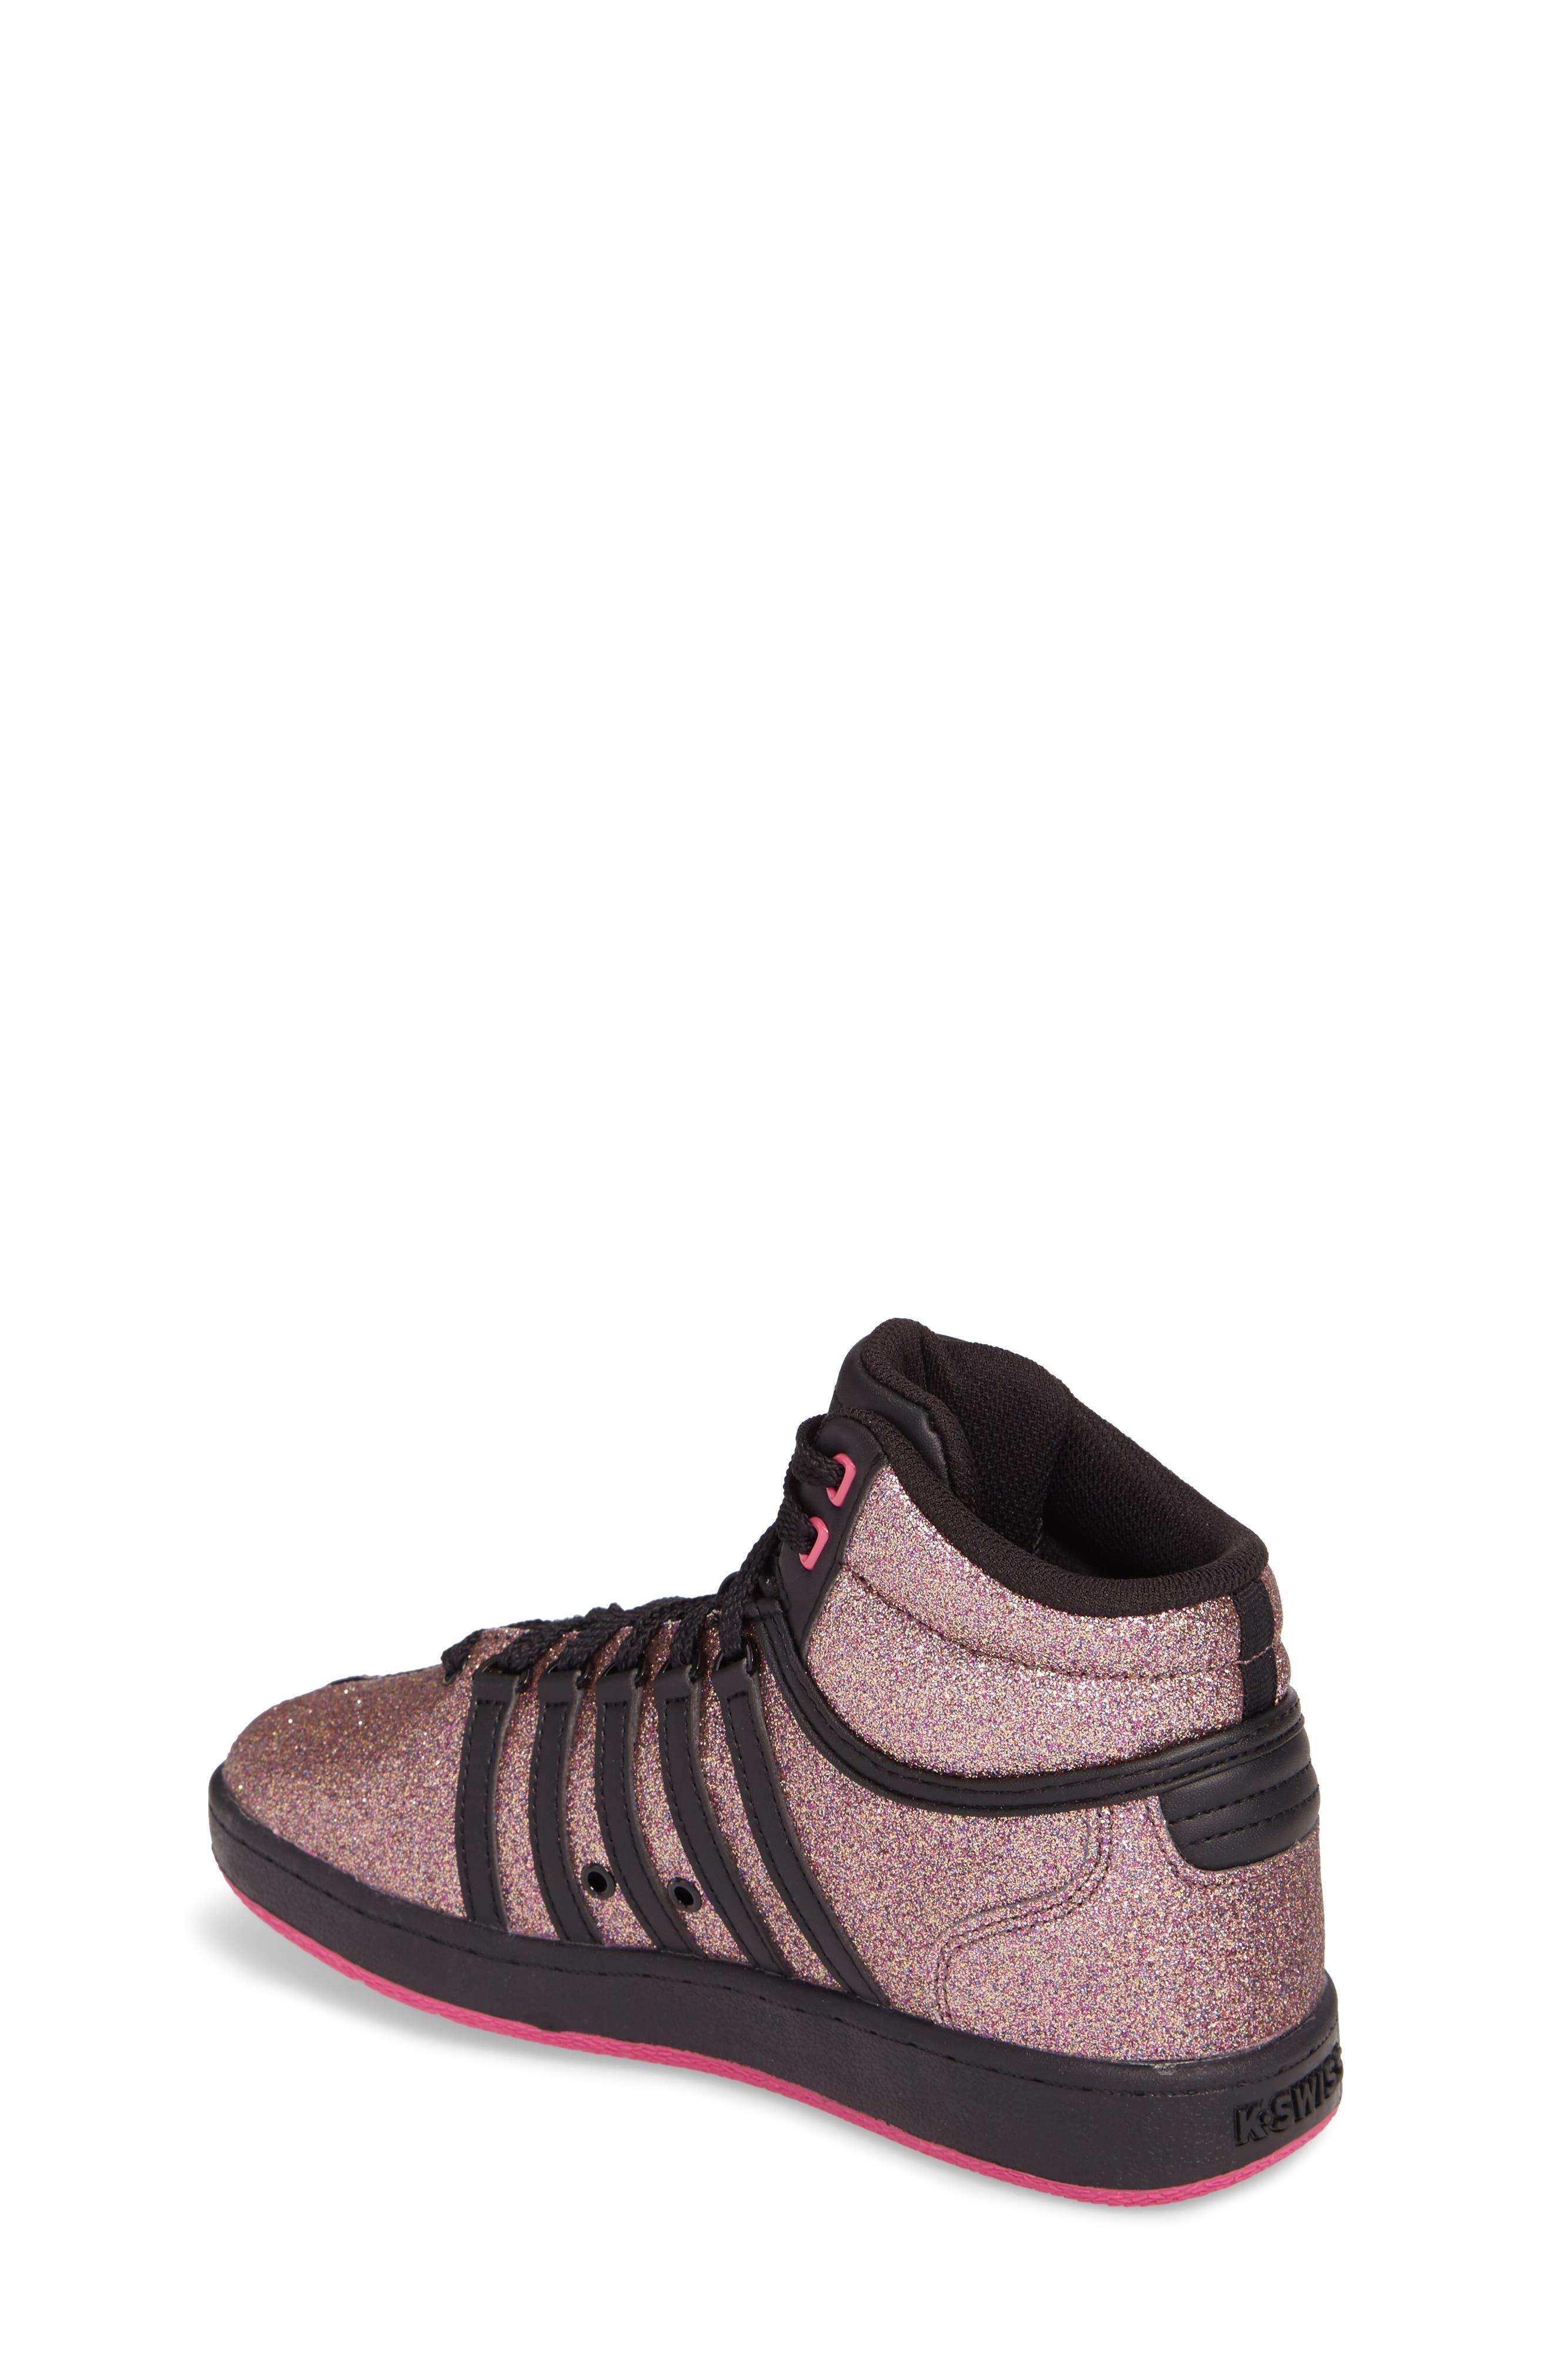 Classic VN Sparkle Mid Sneaker,                             Alternate thumbnail 2, color,                             MULTI SPARKLE